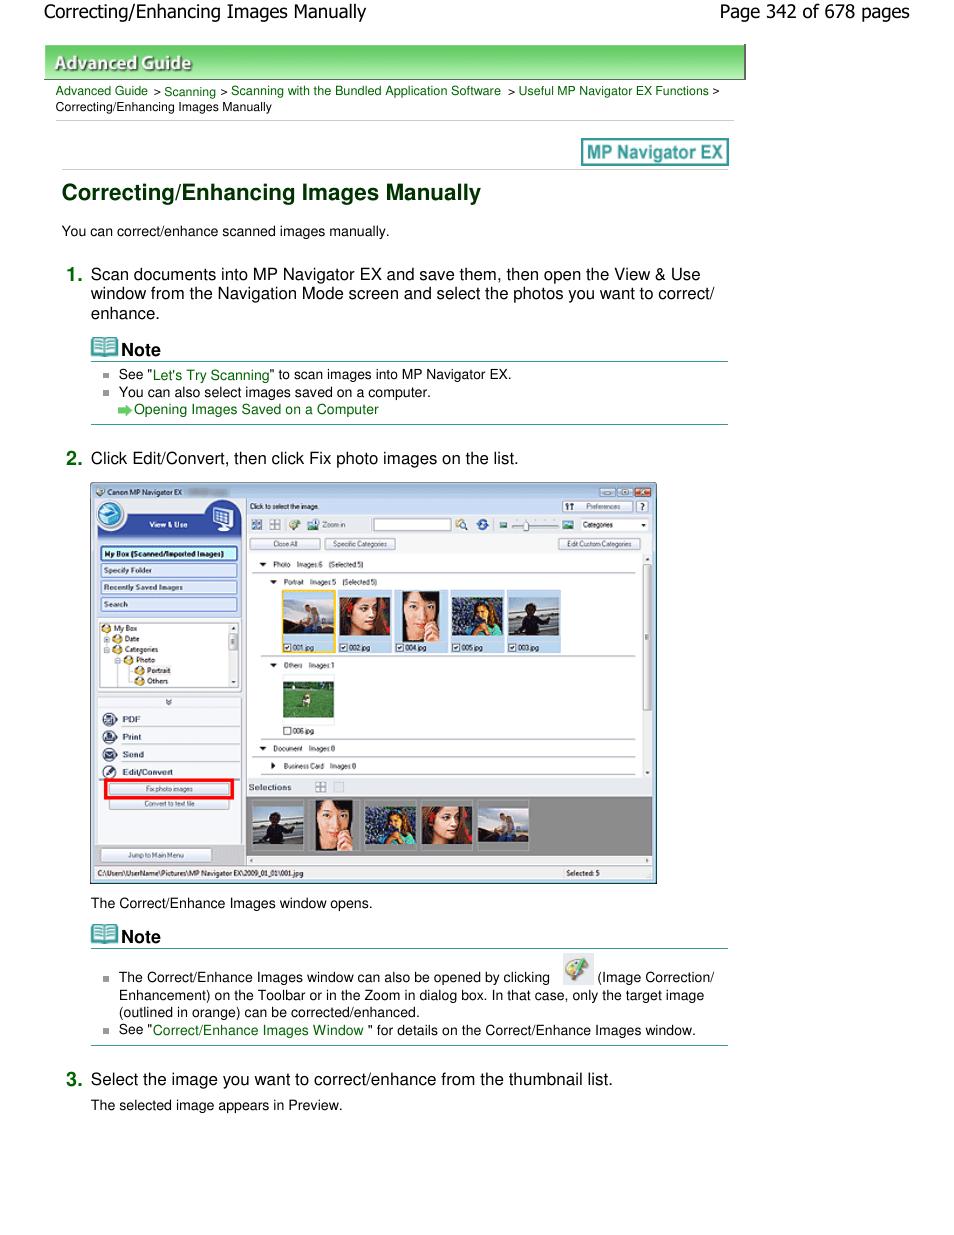 correcting enhancing images manually canon pixma mp250 user manual rh manualsdir com canon mp240 manual pdf canon mp250 manual service